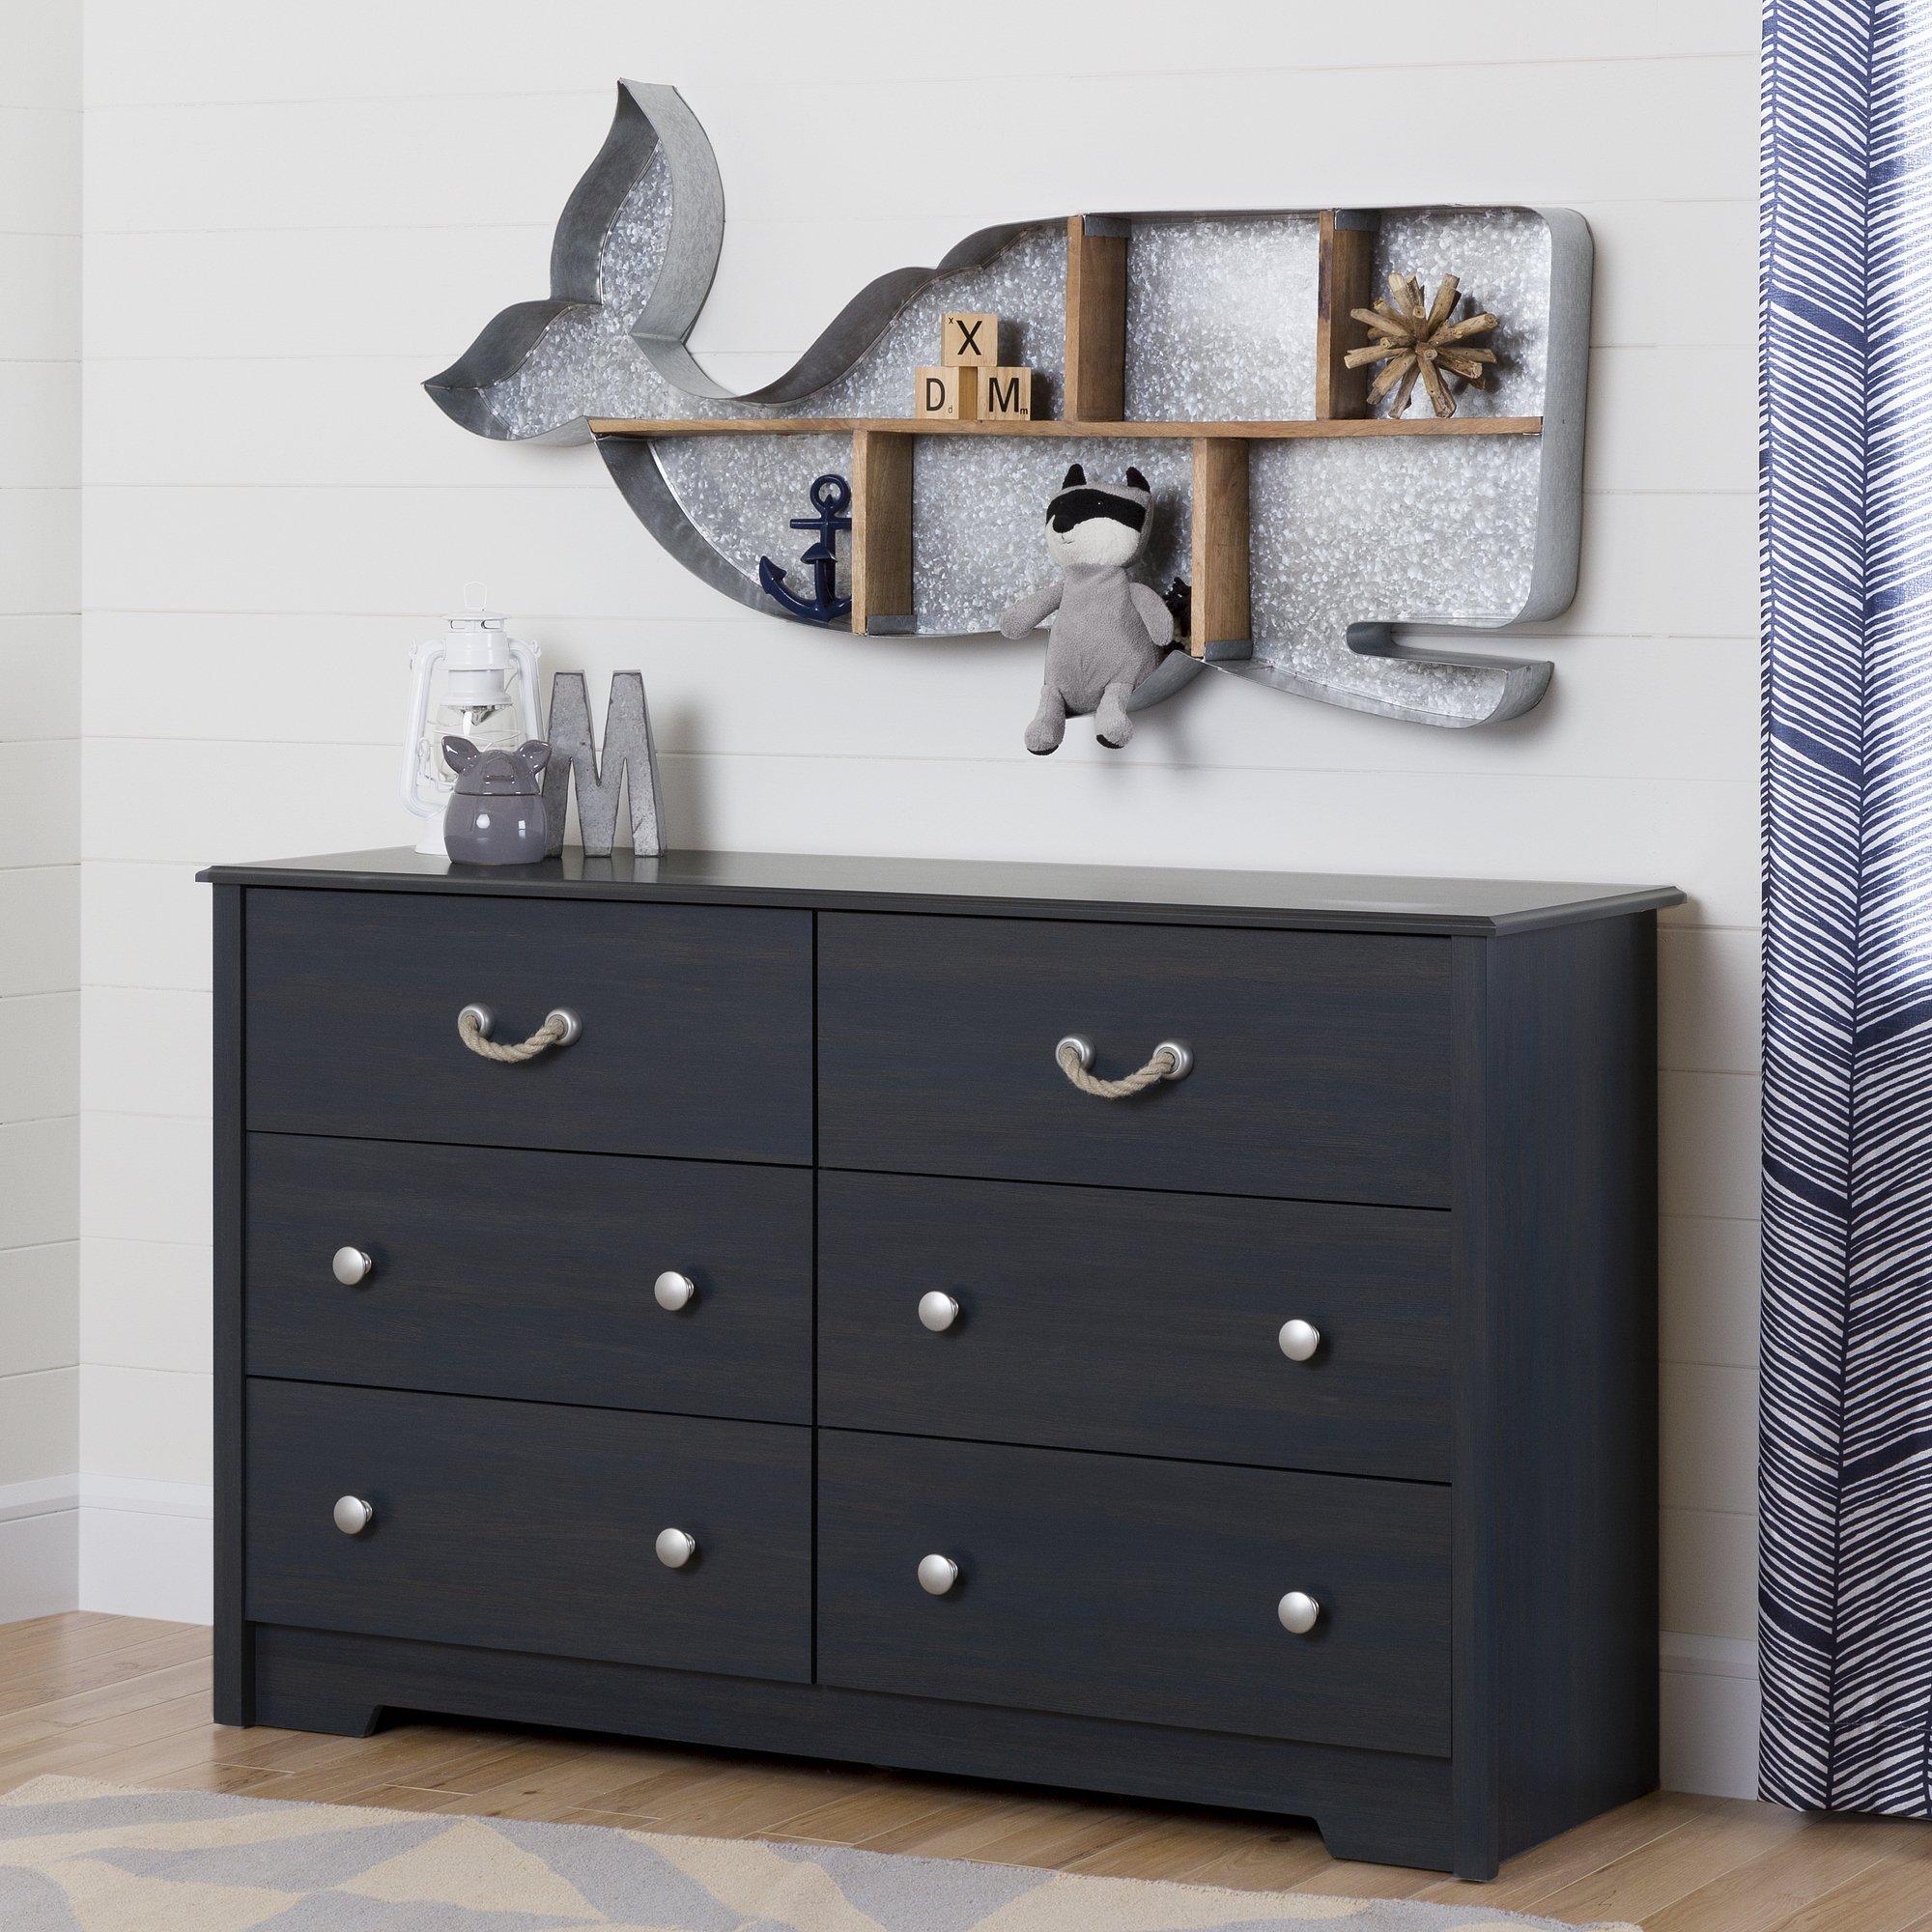 South Shore Aviron 6-Drawer Double Dresser, Blueberry